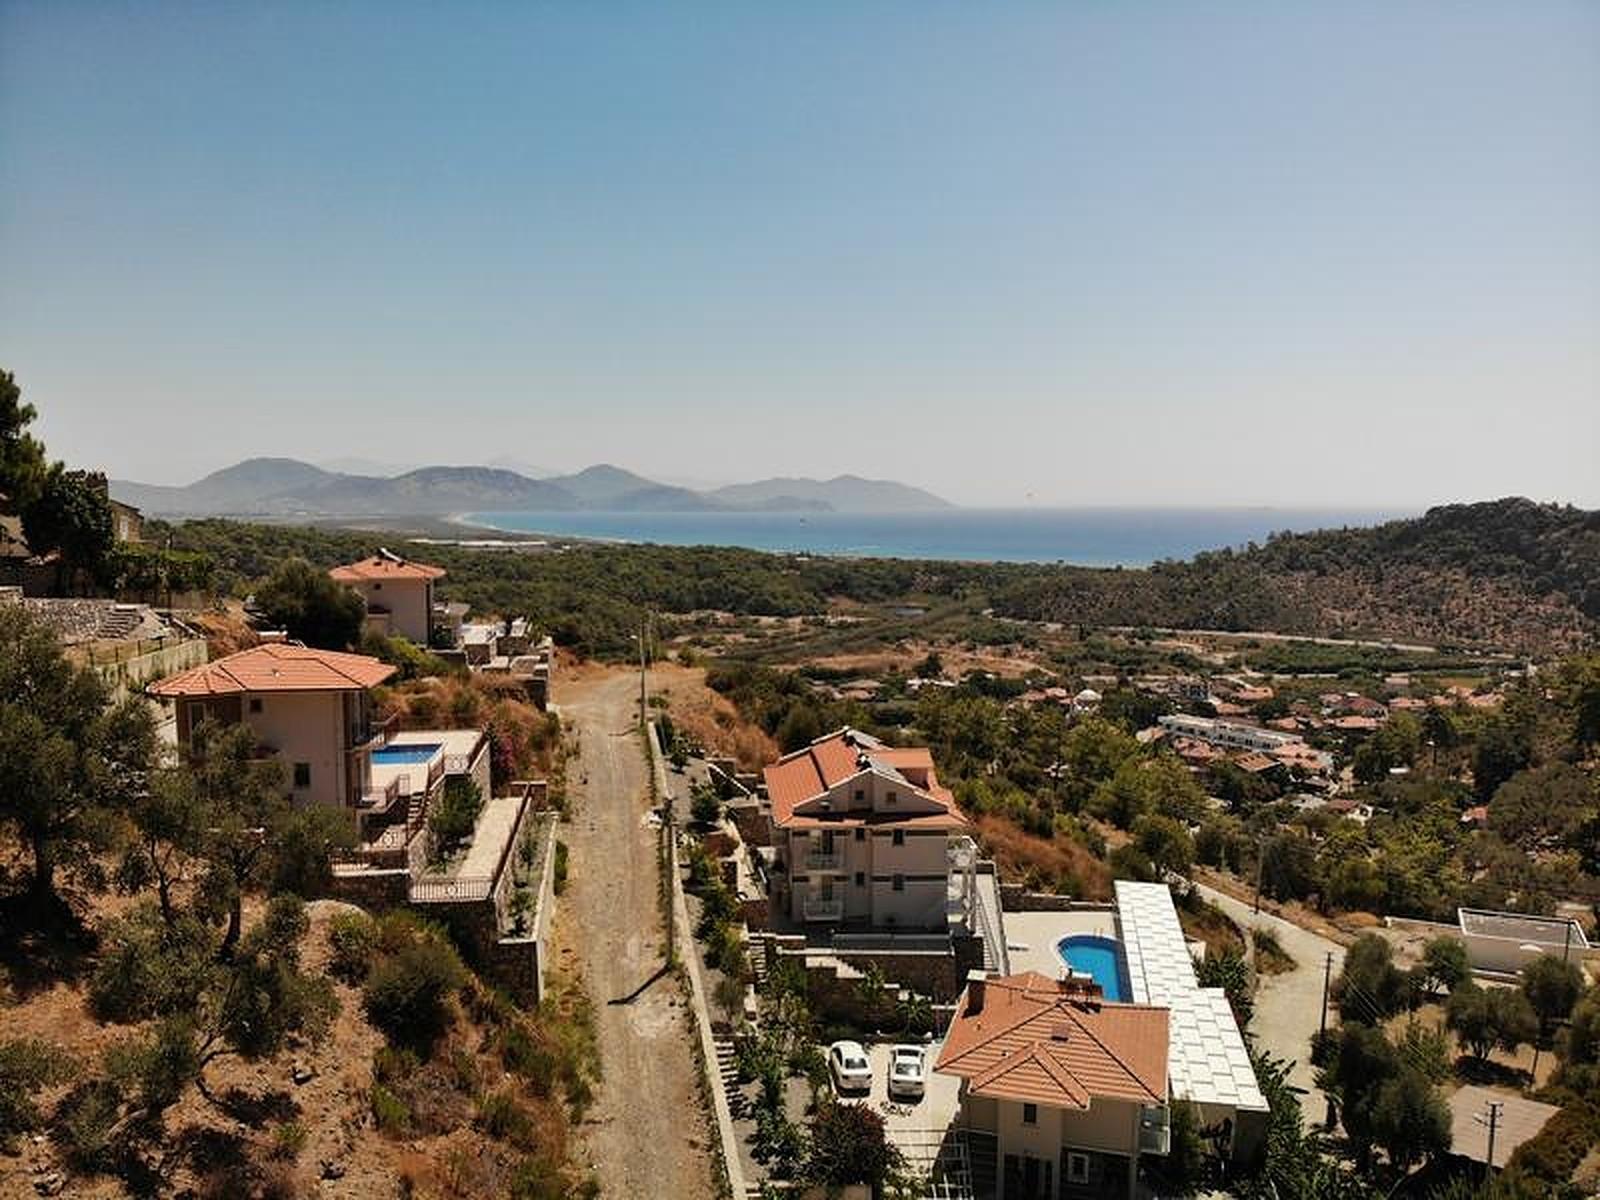 Ferienwohnung Begonville Apartment Klein (2654617), Sarıgerme, , Ägäisregion, Türkei, Bild 6